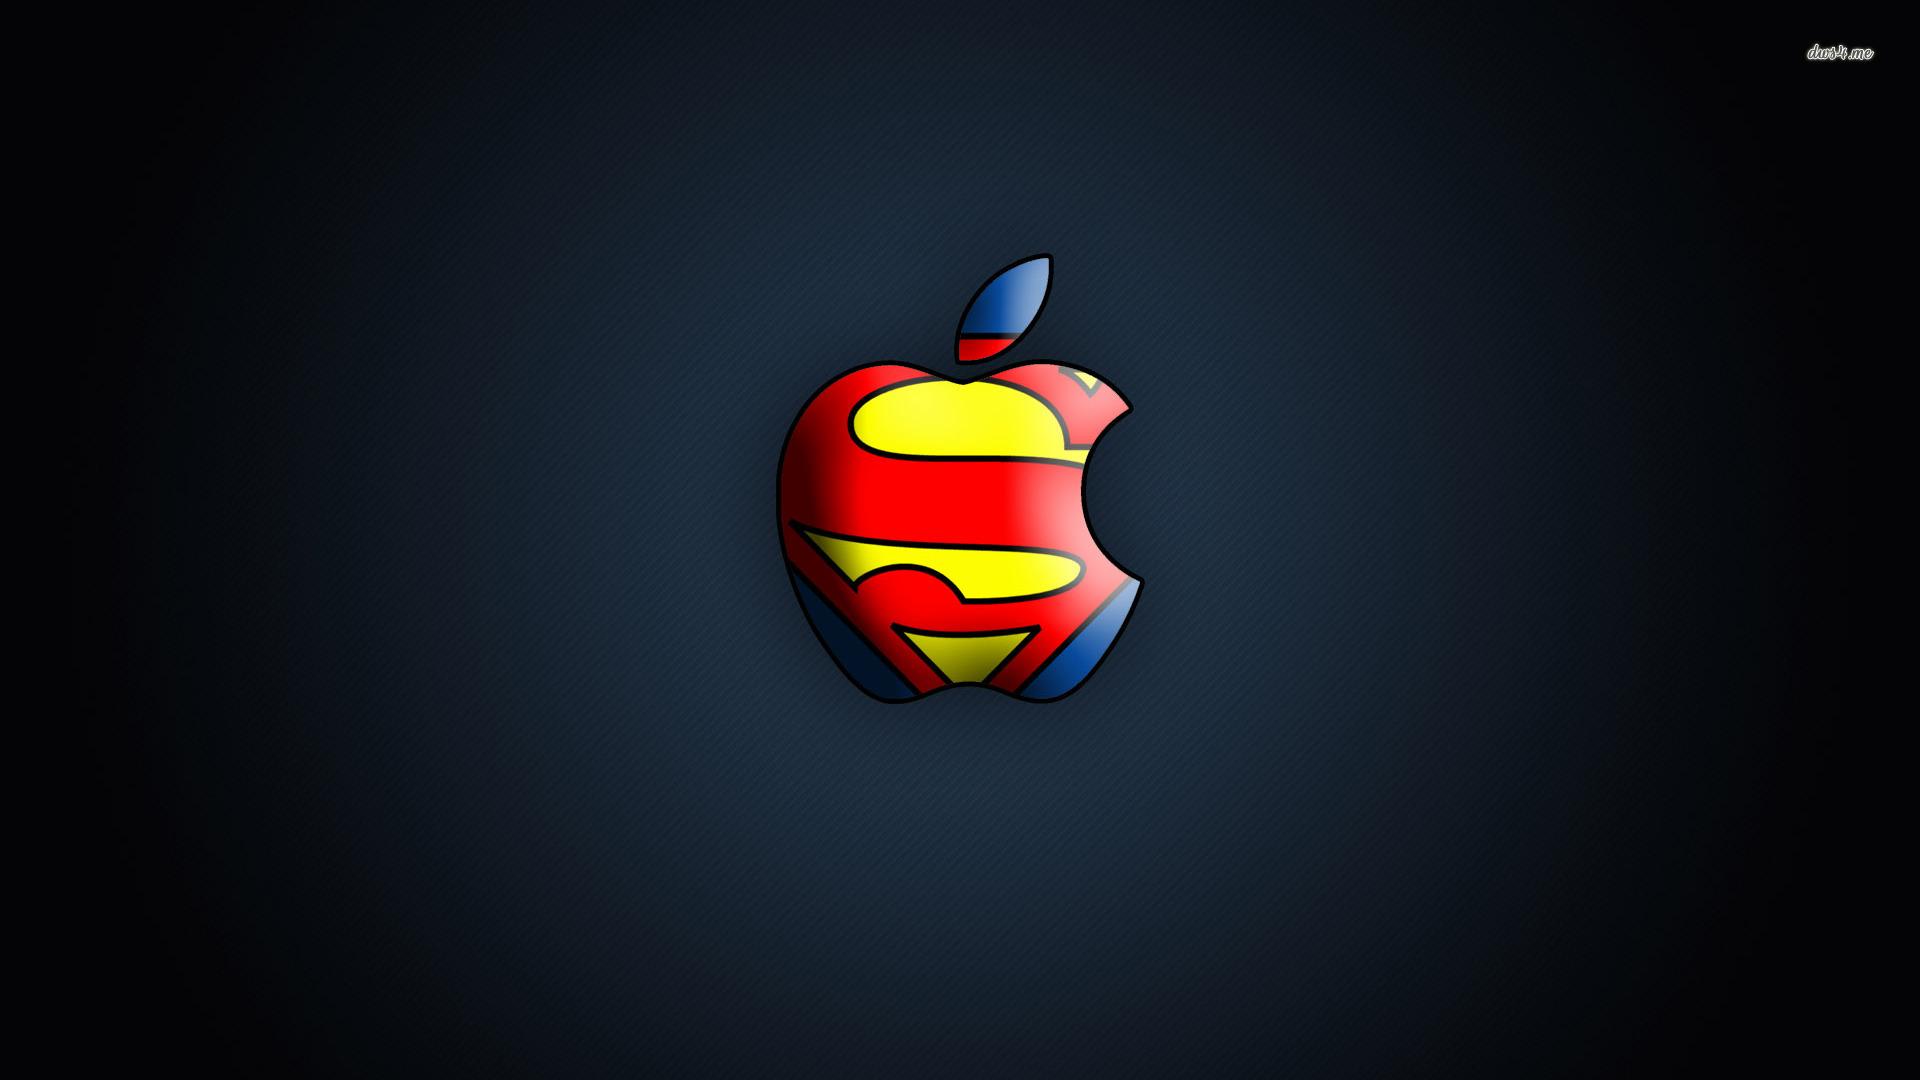 Superman Apple wallpaper   Computer wallpapers   28501 1920x1080